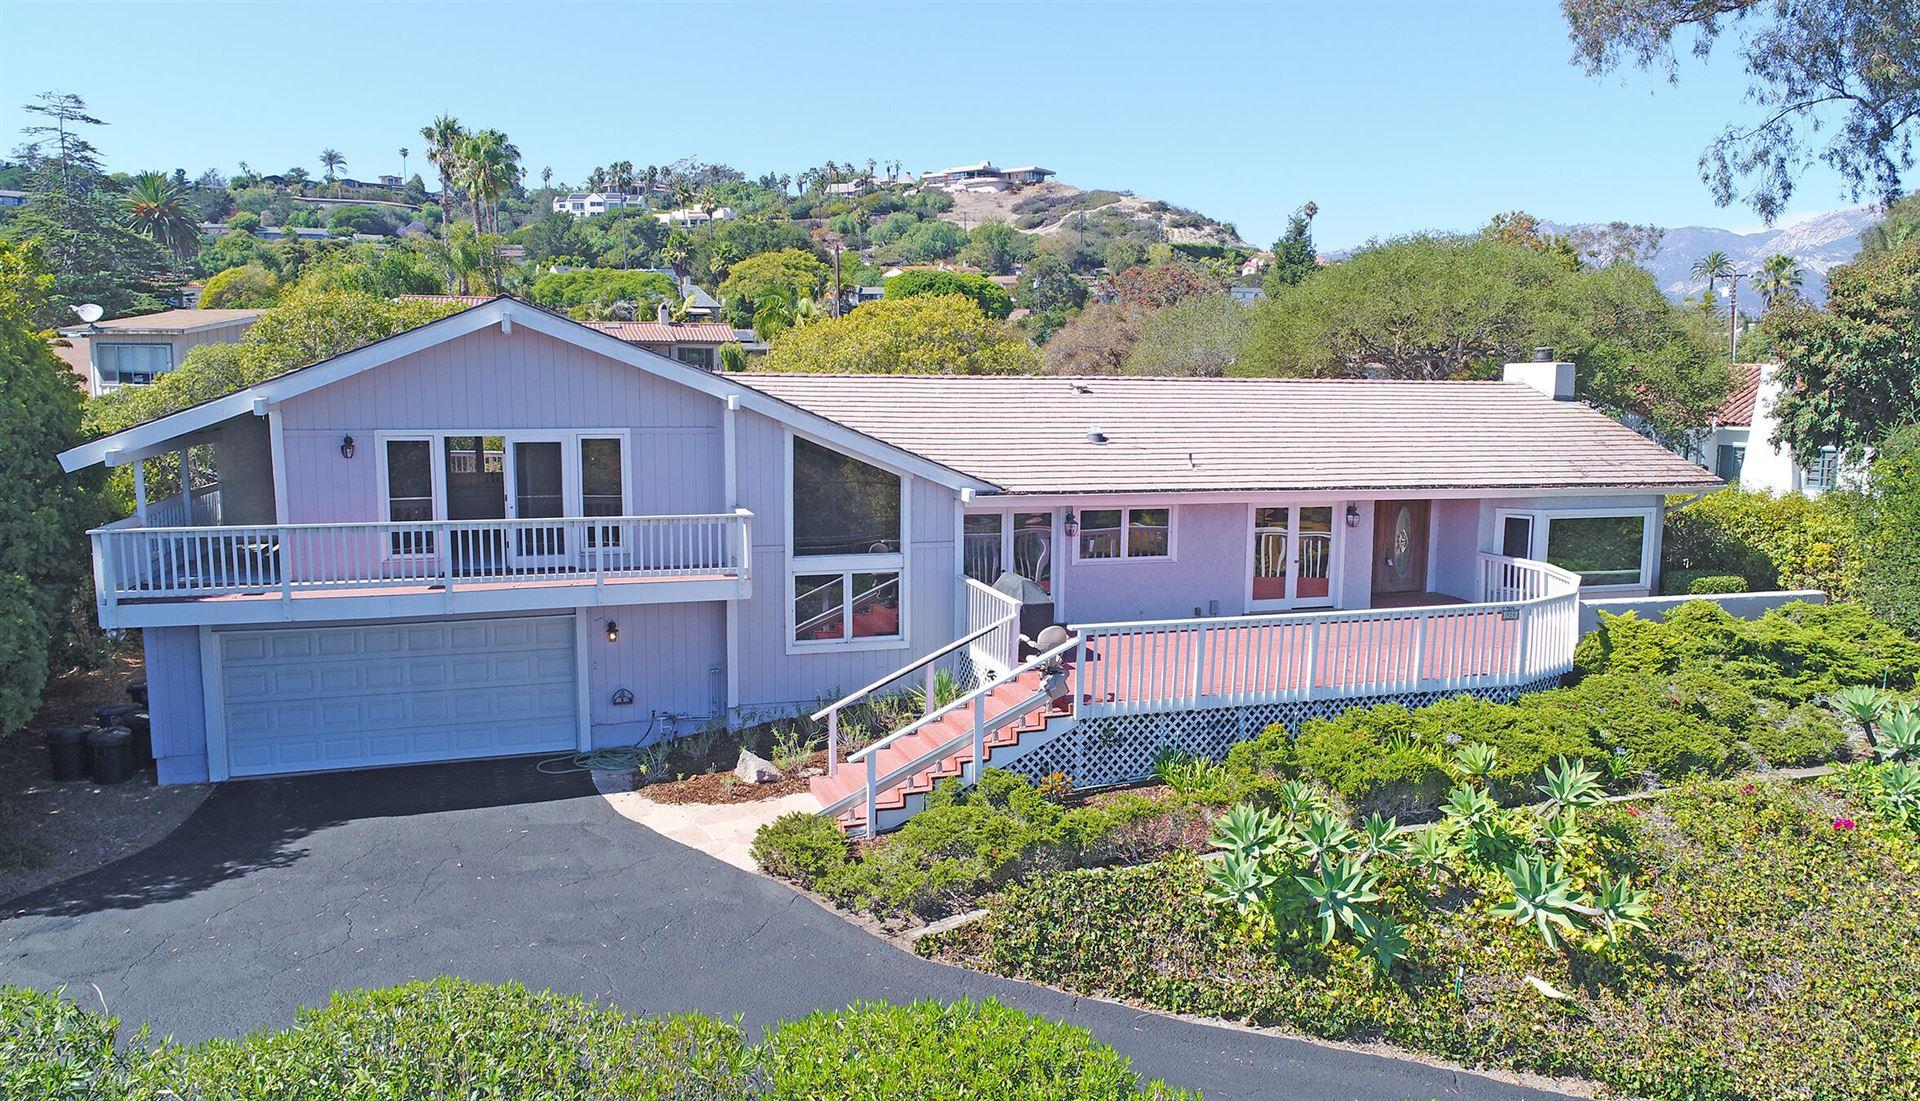 920 Weldon Rd, Santa Barbara, CA 93109 - MLS#: 21-3442